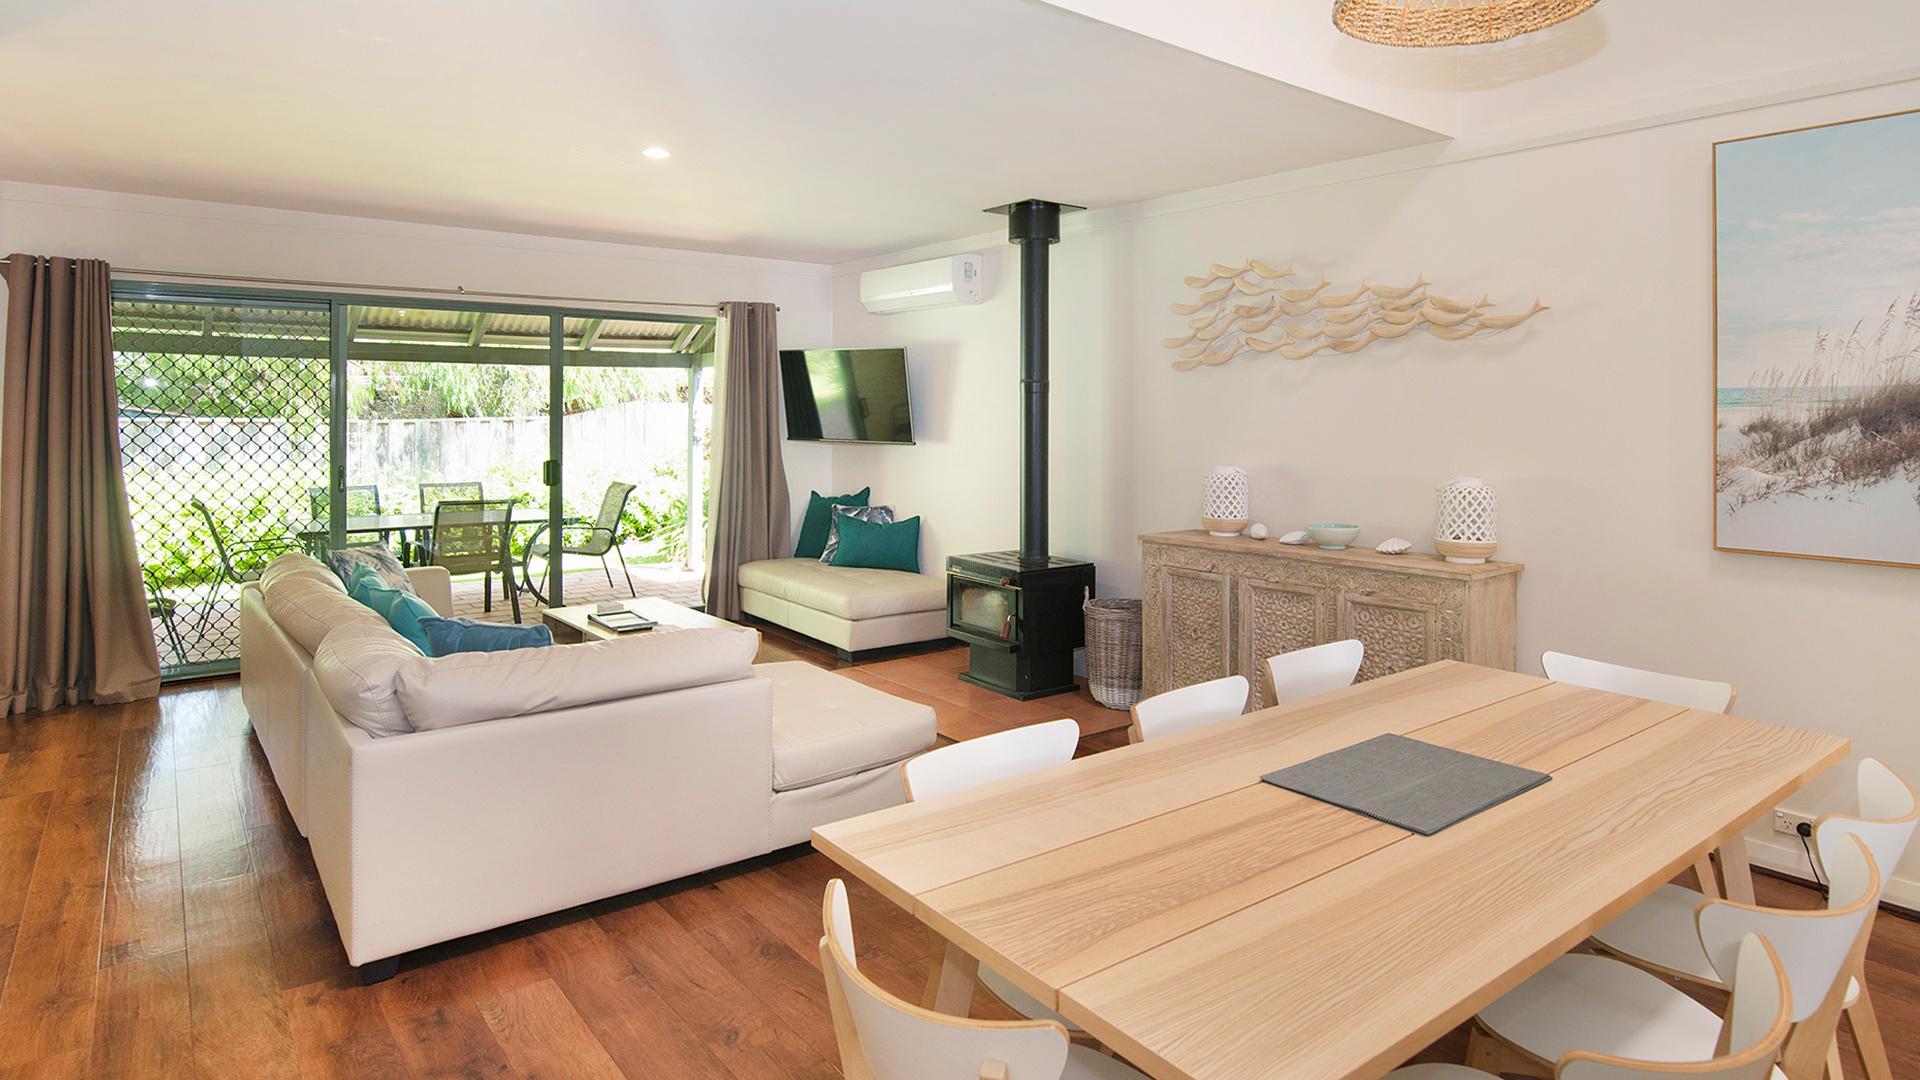 Two-Bedroom Villa image 1 at Bayshore Beachside Resort by City of Busselton, Western Australia, Australia